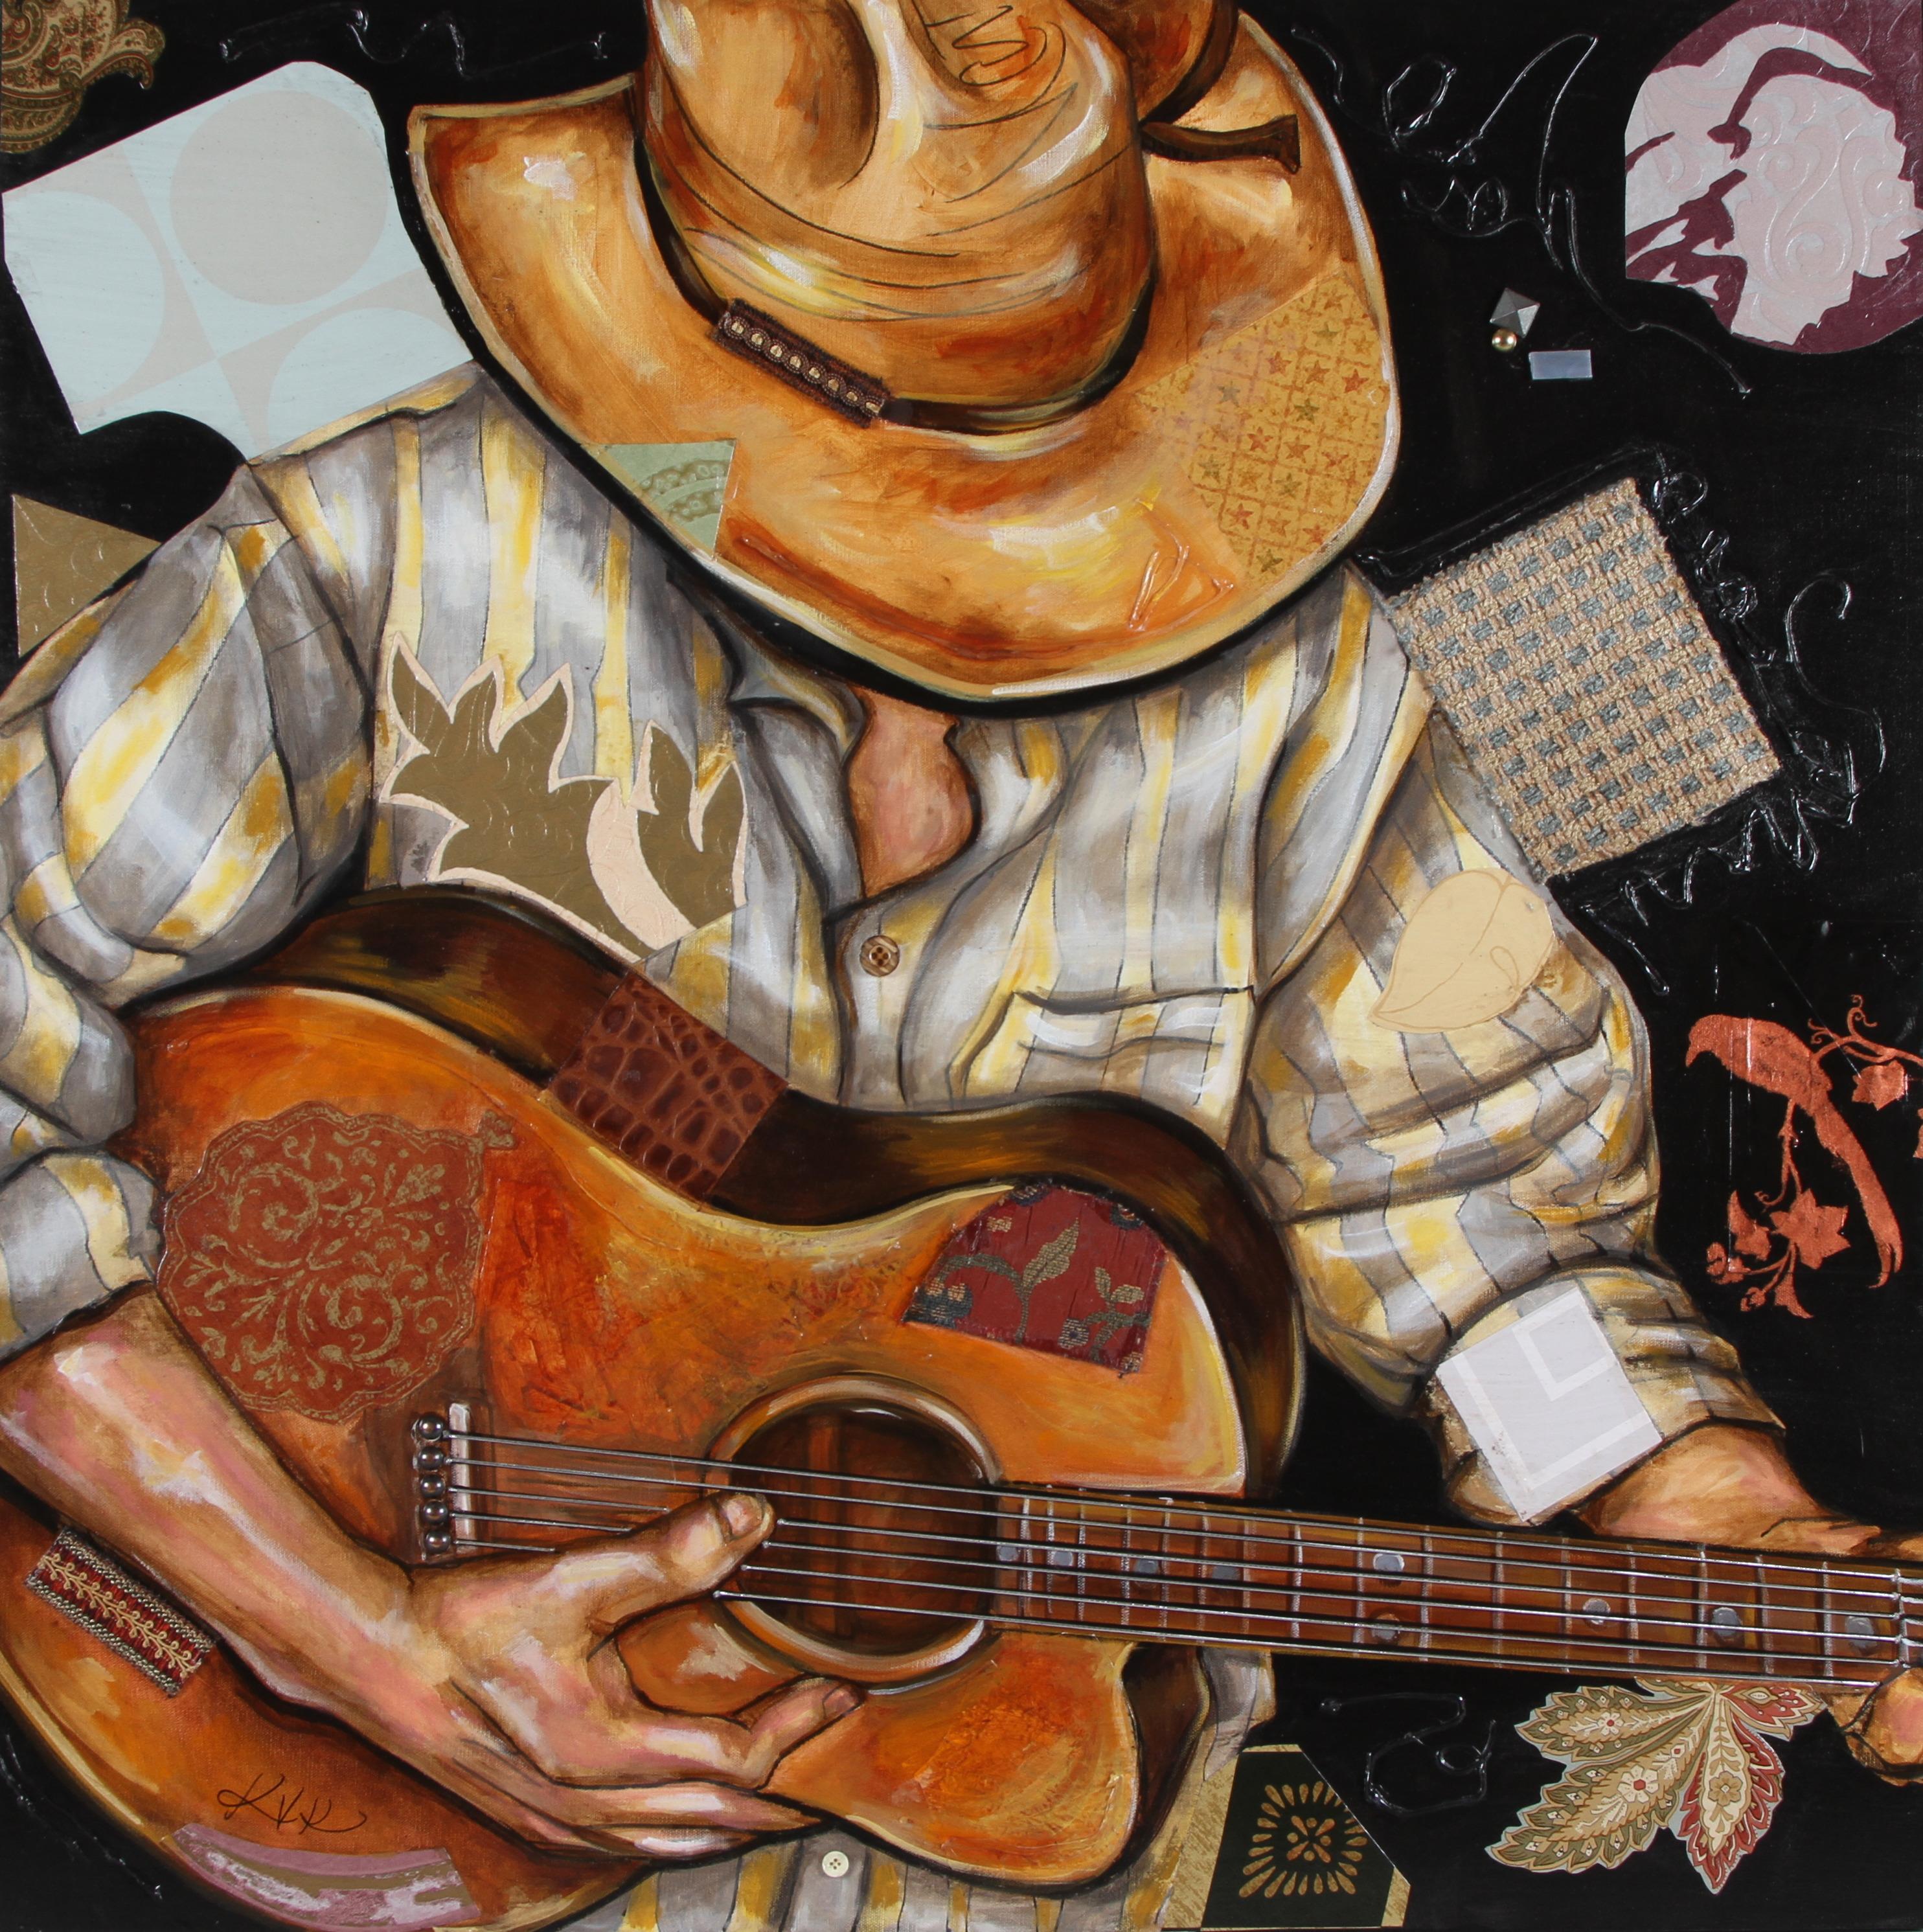 Vaquero de the acoustic guitar cwrrxv